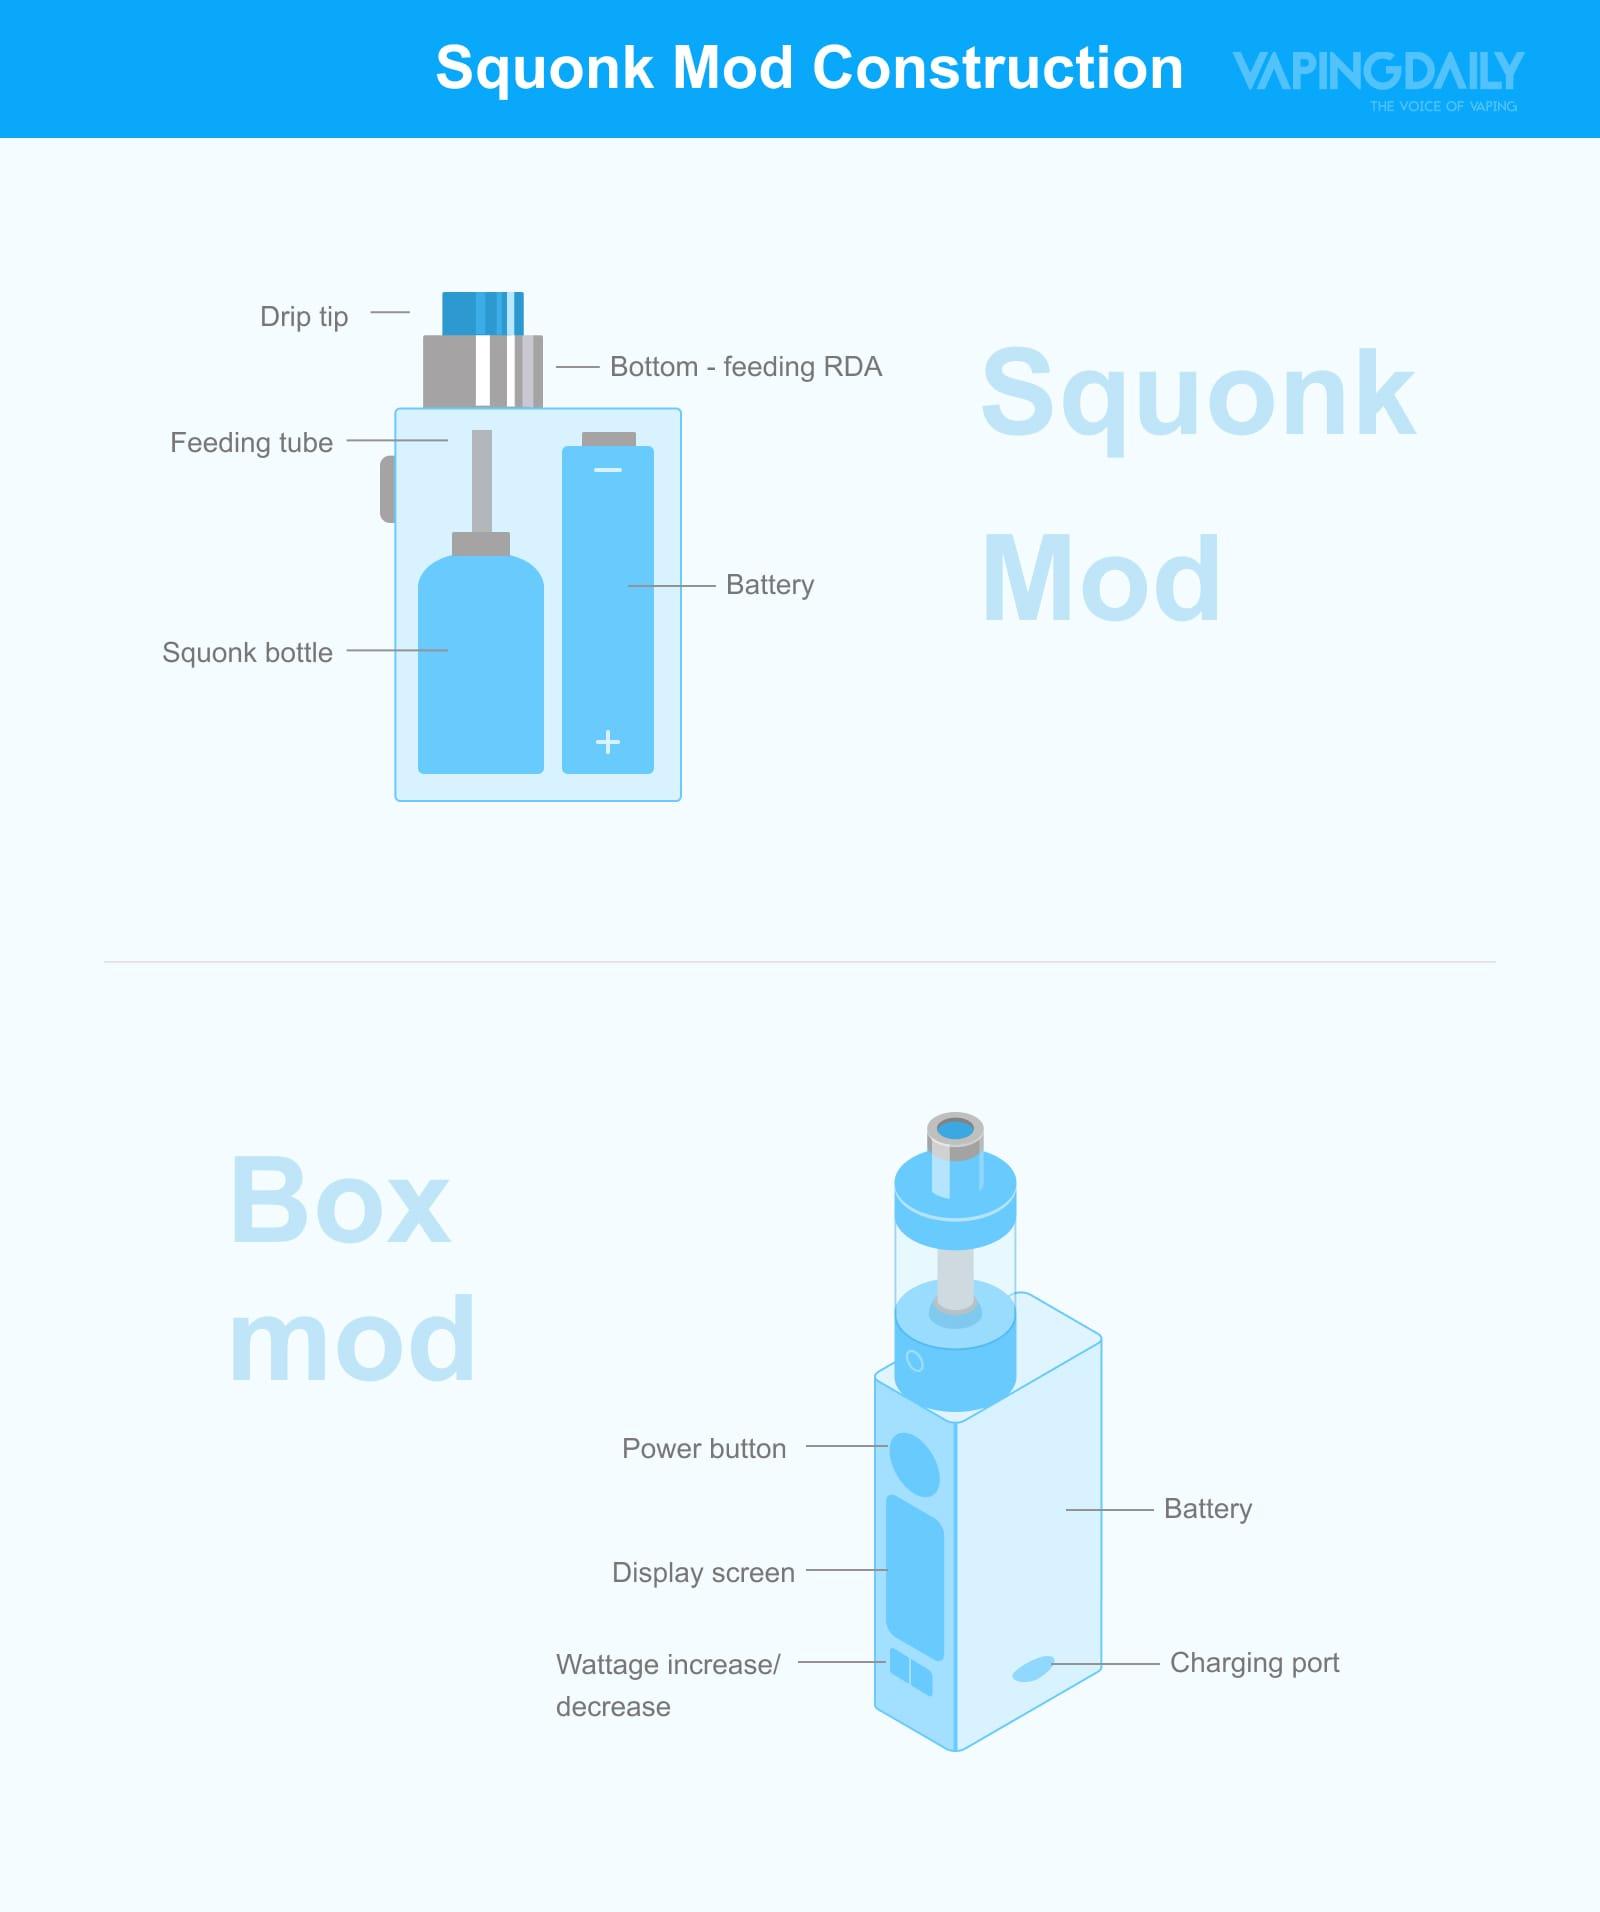 Squonk Mod Construction image